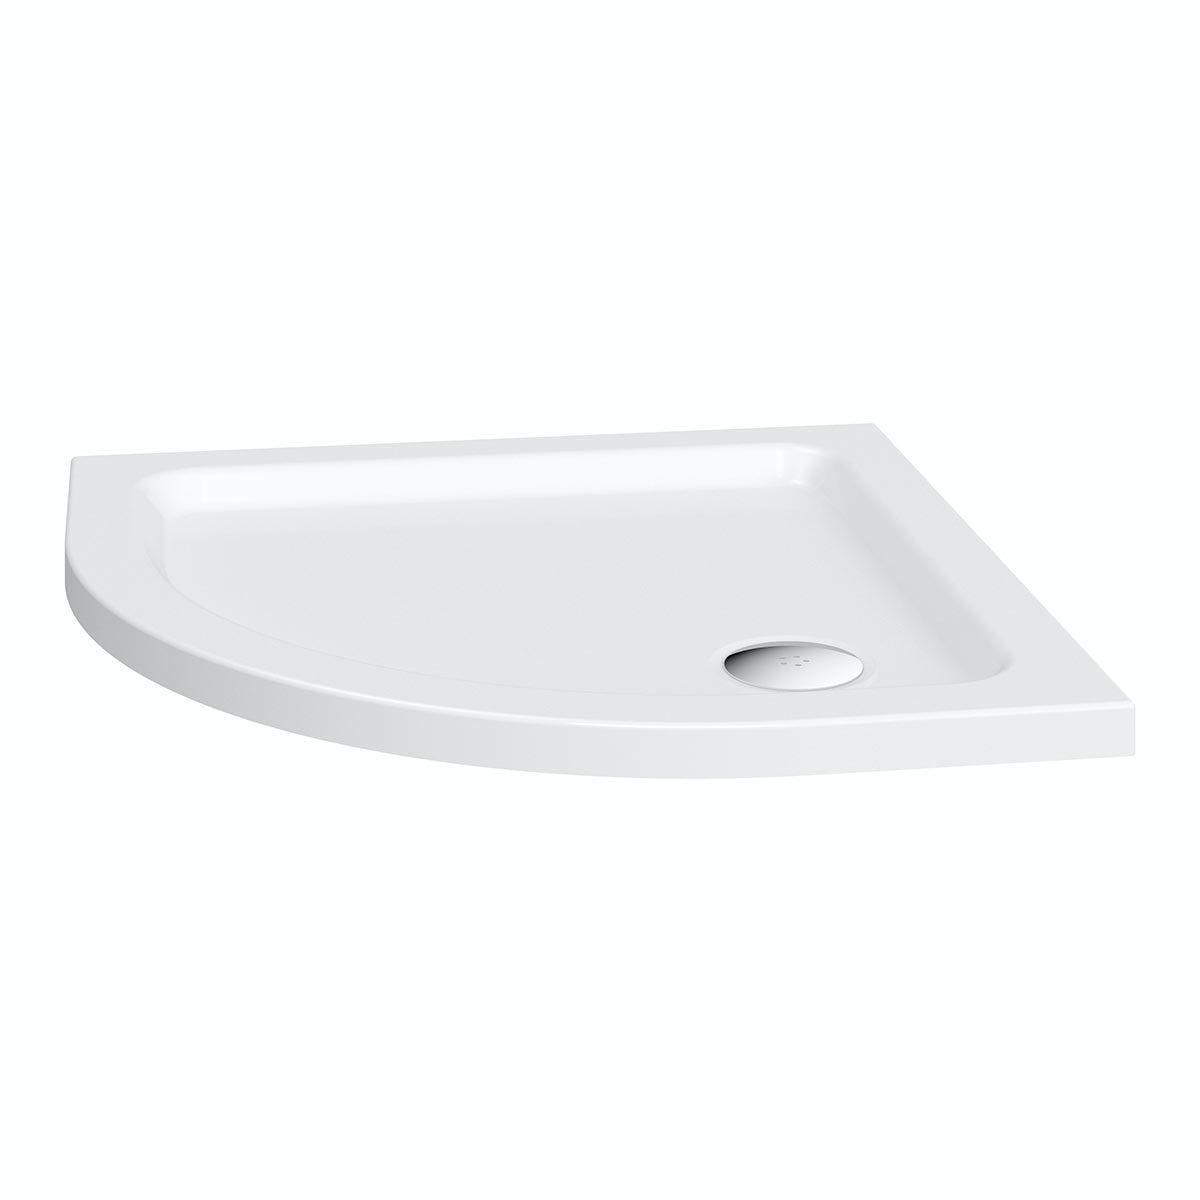 Simplite Quadrant Shower Tray